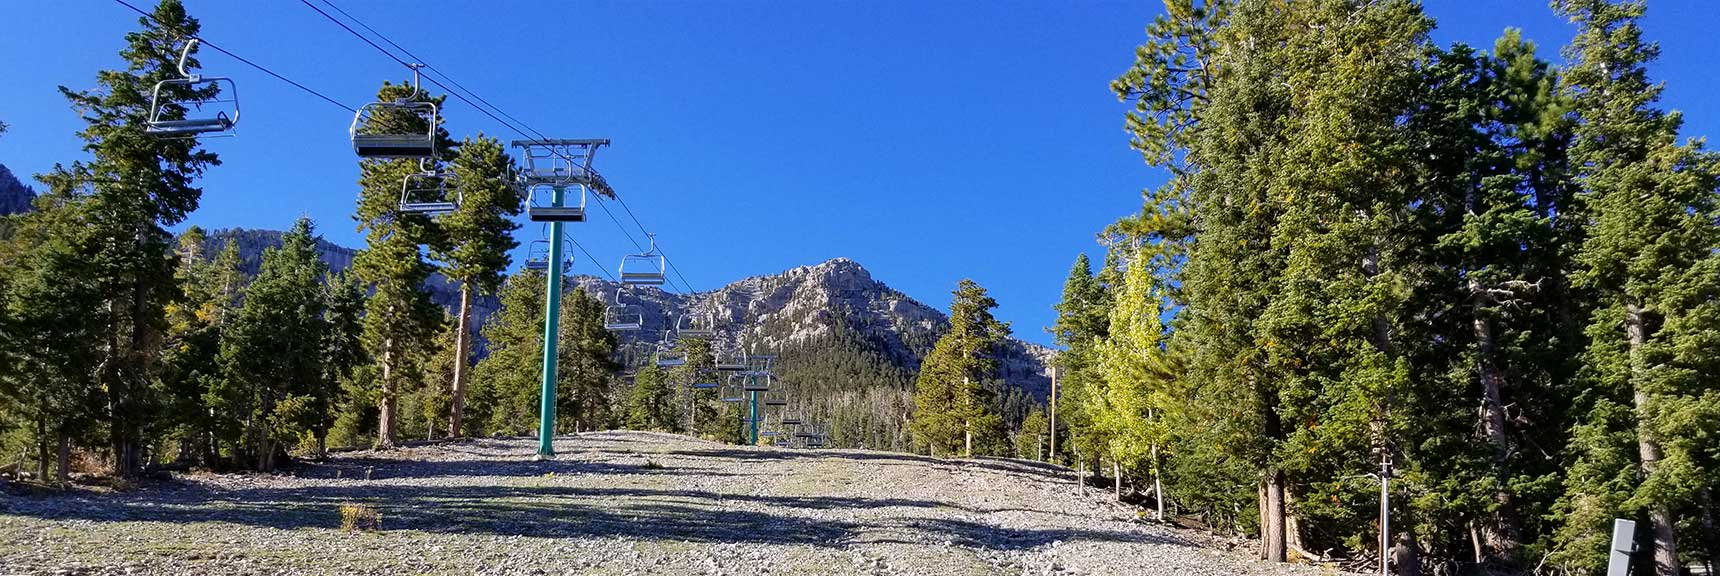 Ascending Ski Run Toward Lee Peak in Lee Canyon, Nevada